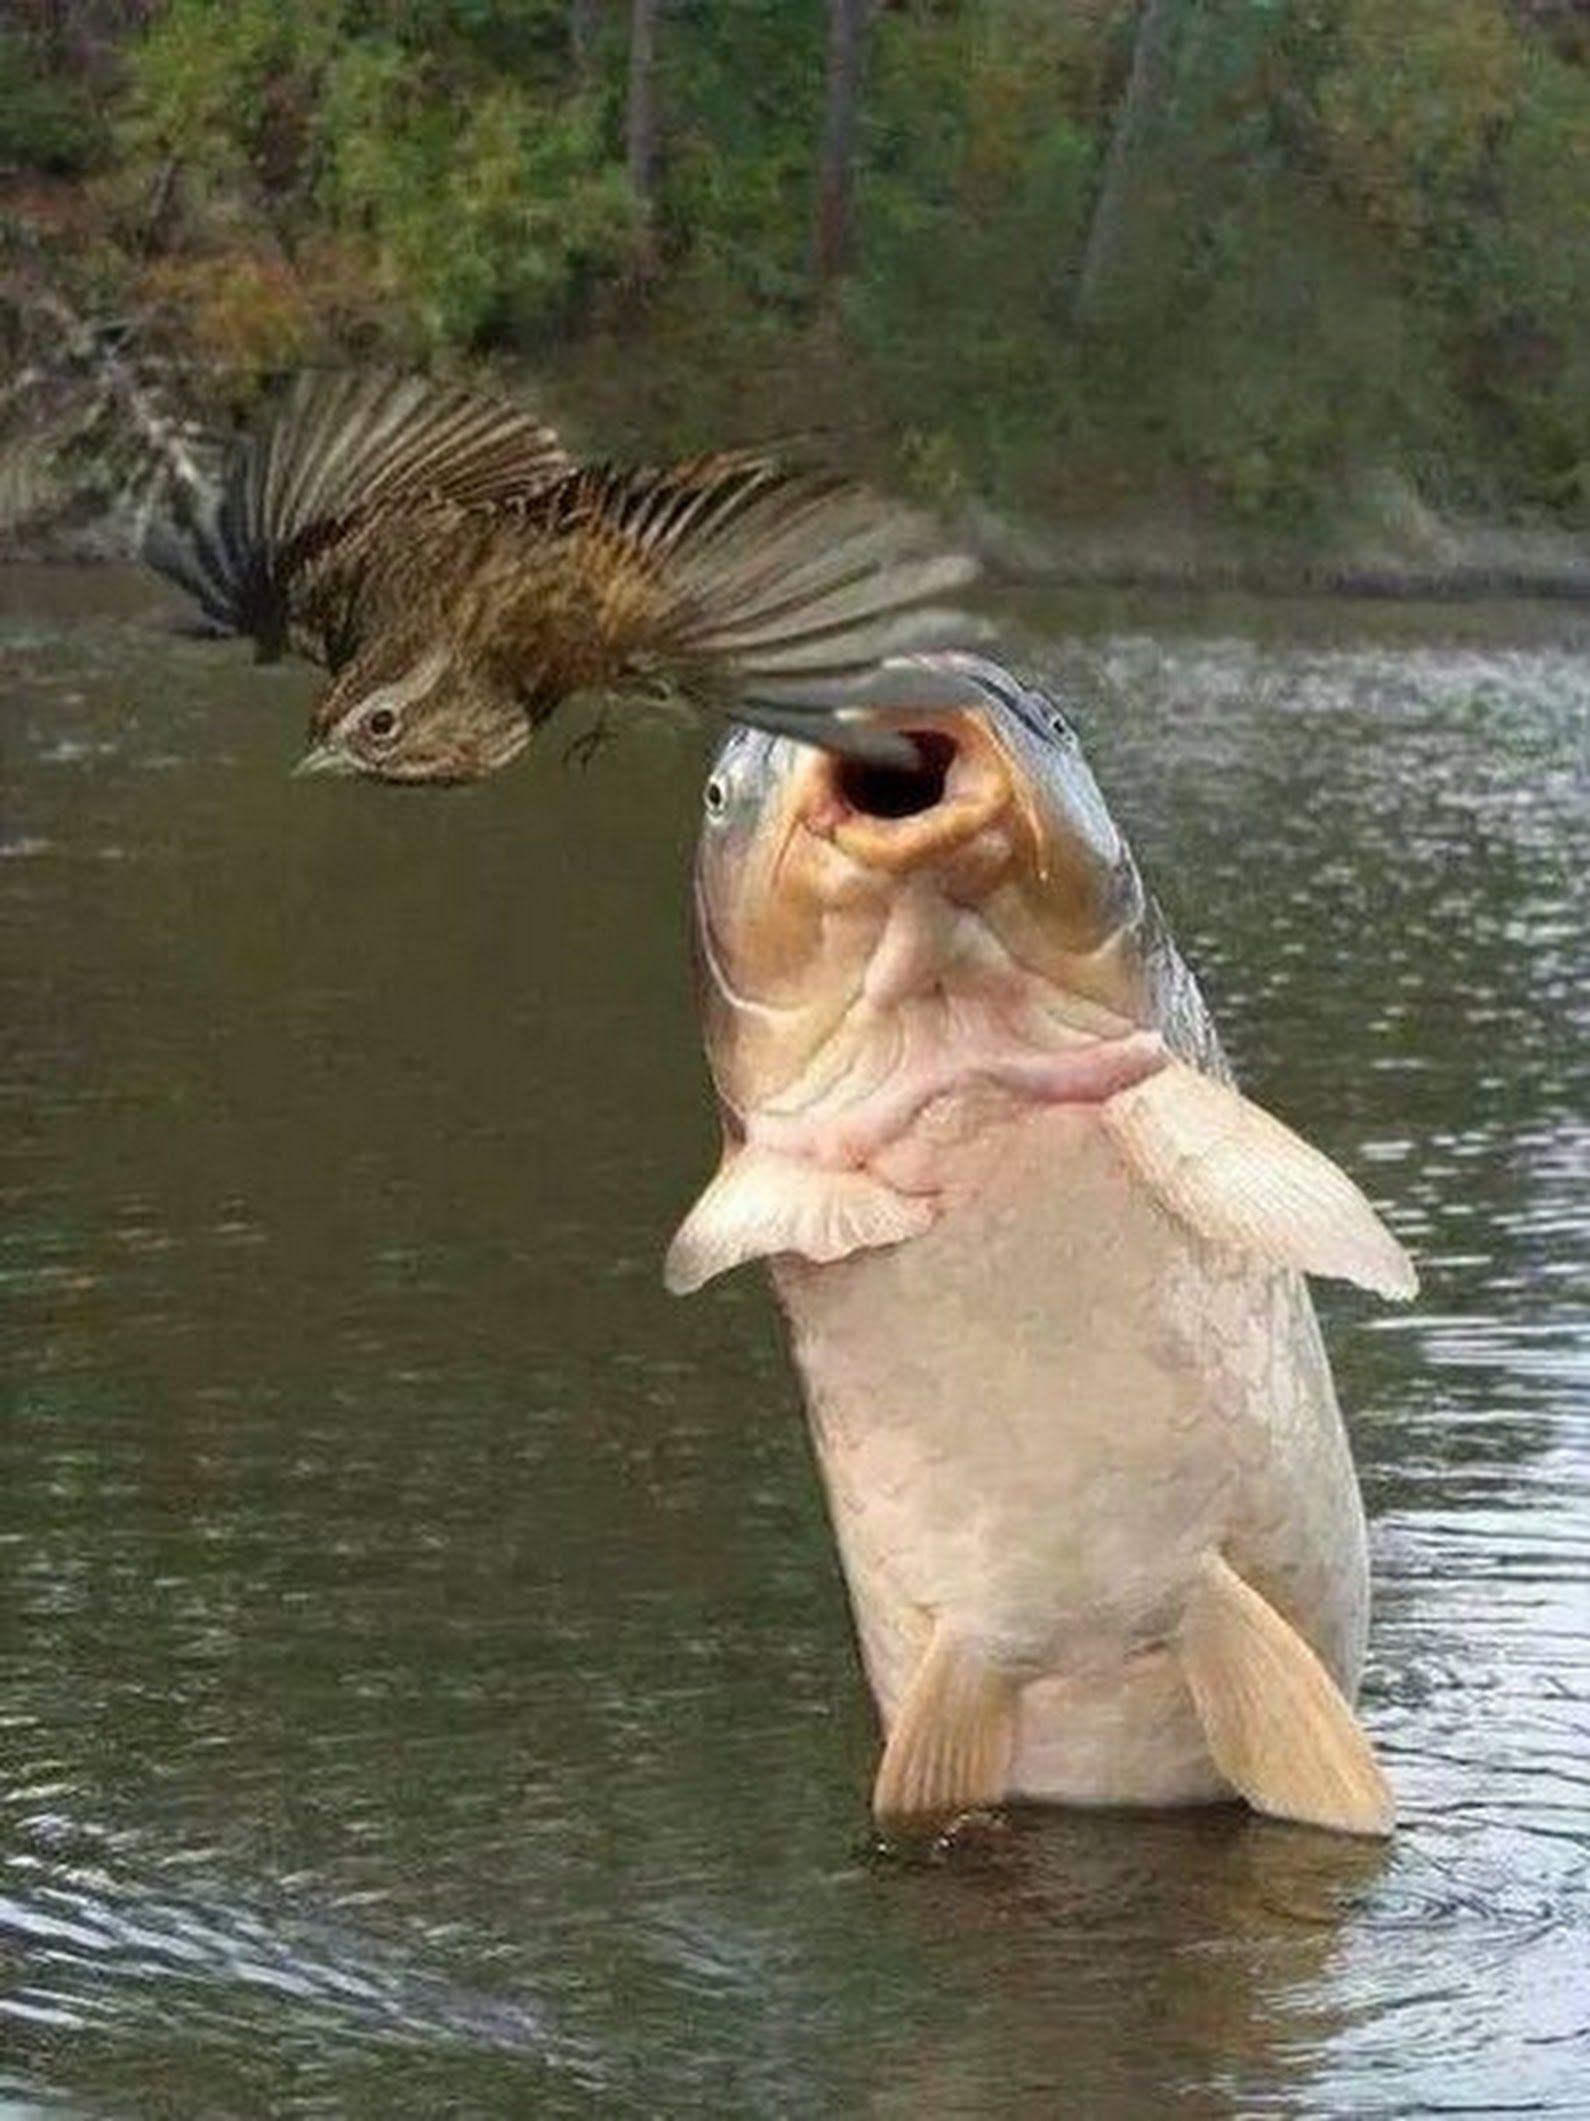 те, приколы фото с рыбой сбитое тело птицы